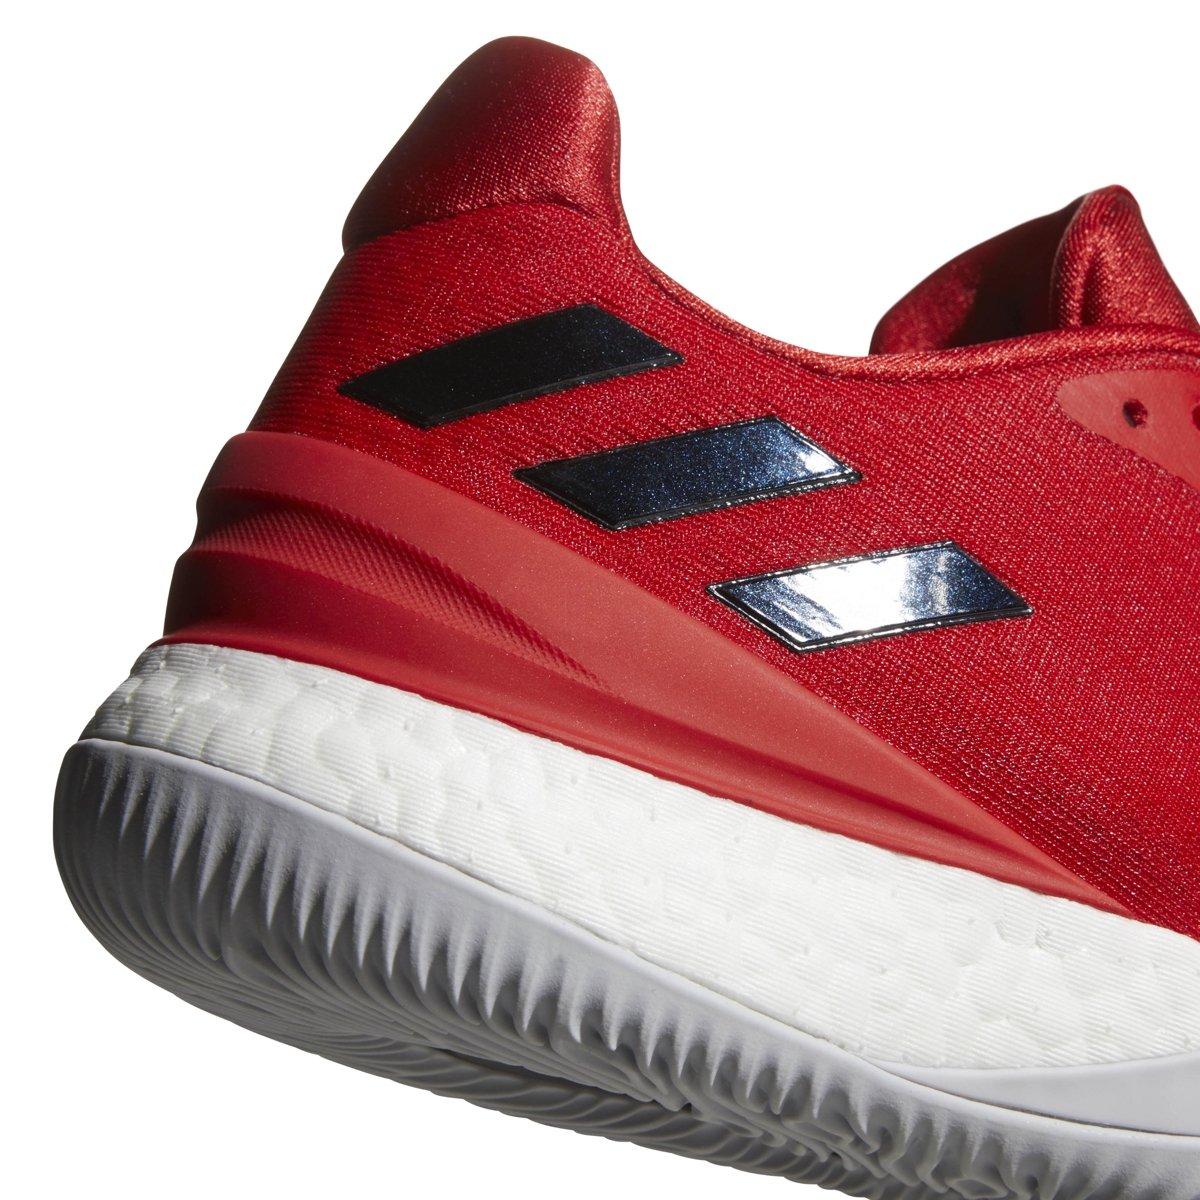 Amazon.com  adidas Men s Crazy Light Boost 2018 Basketball  CoreBlack White Carbon  Shoes 7155713f7